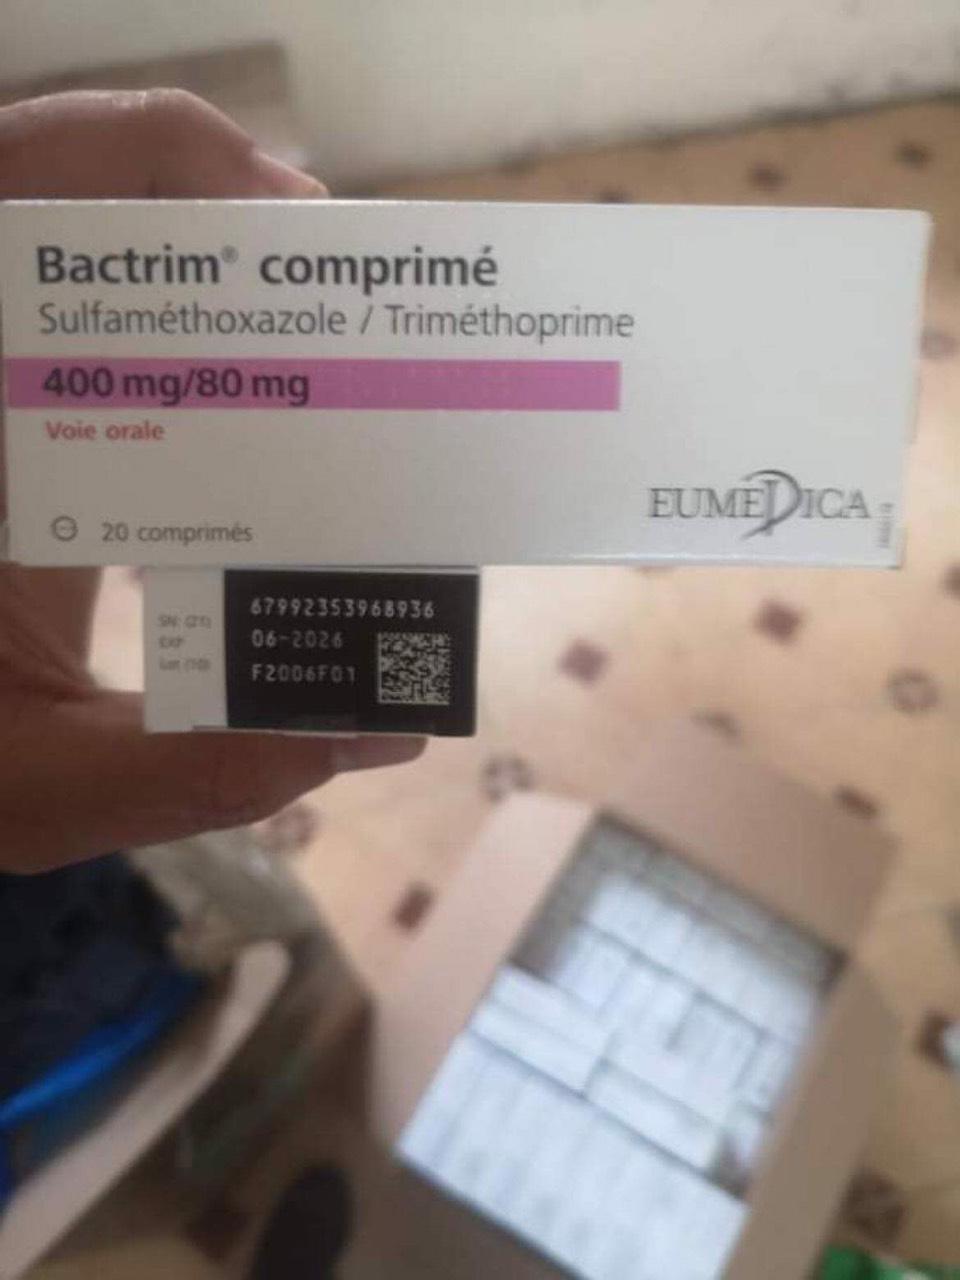 Bactrim 400/80mg